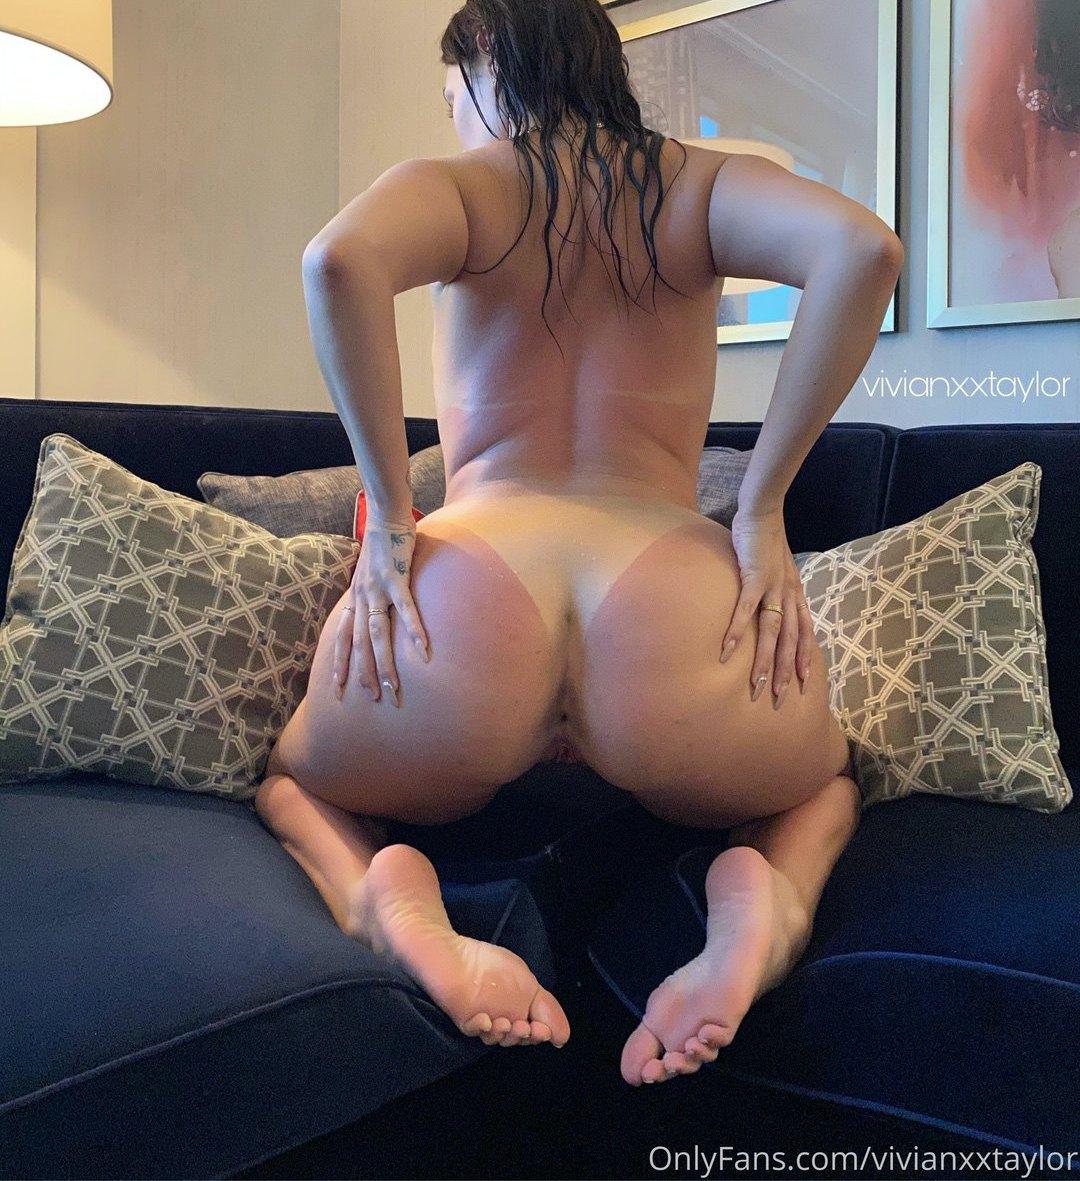 Vivian Taylor Vivianxxtaylor Onlyfans Nudes Leaks 0011